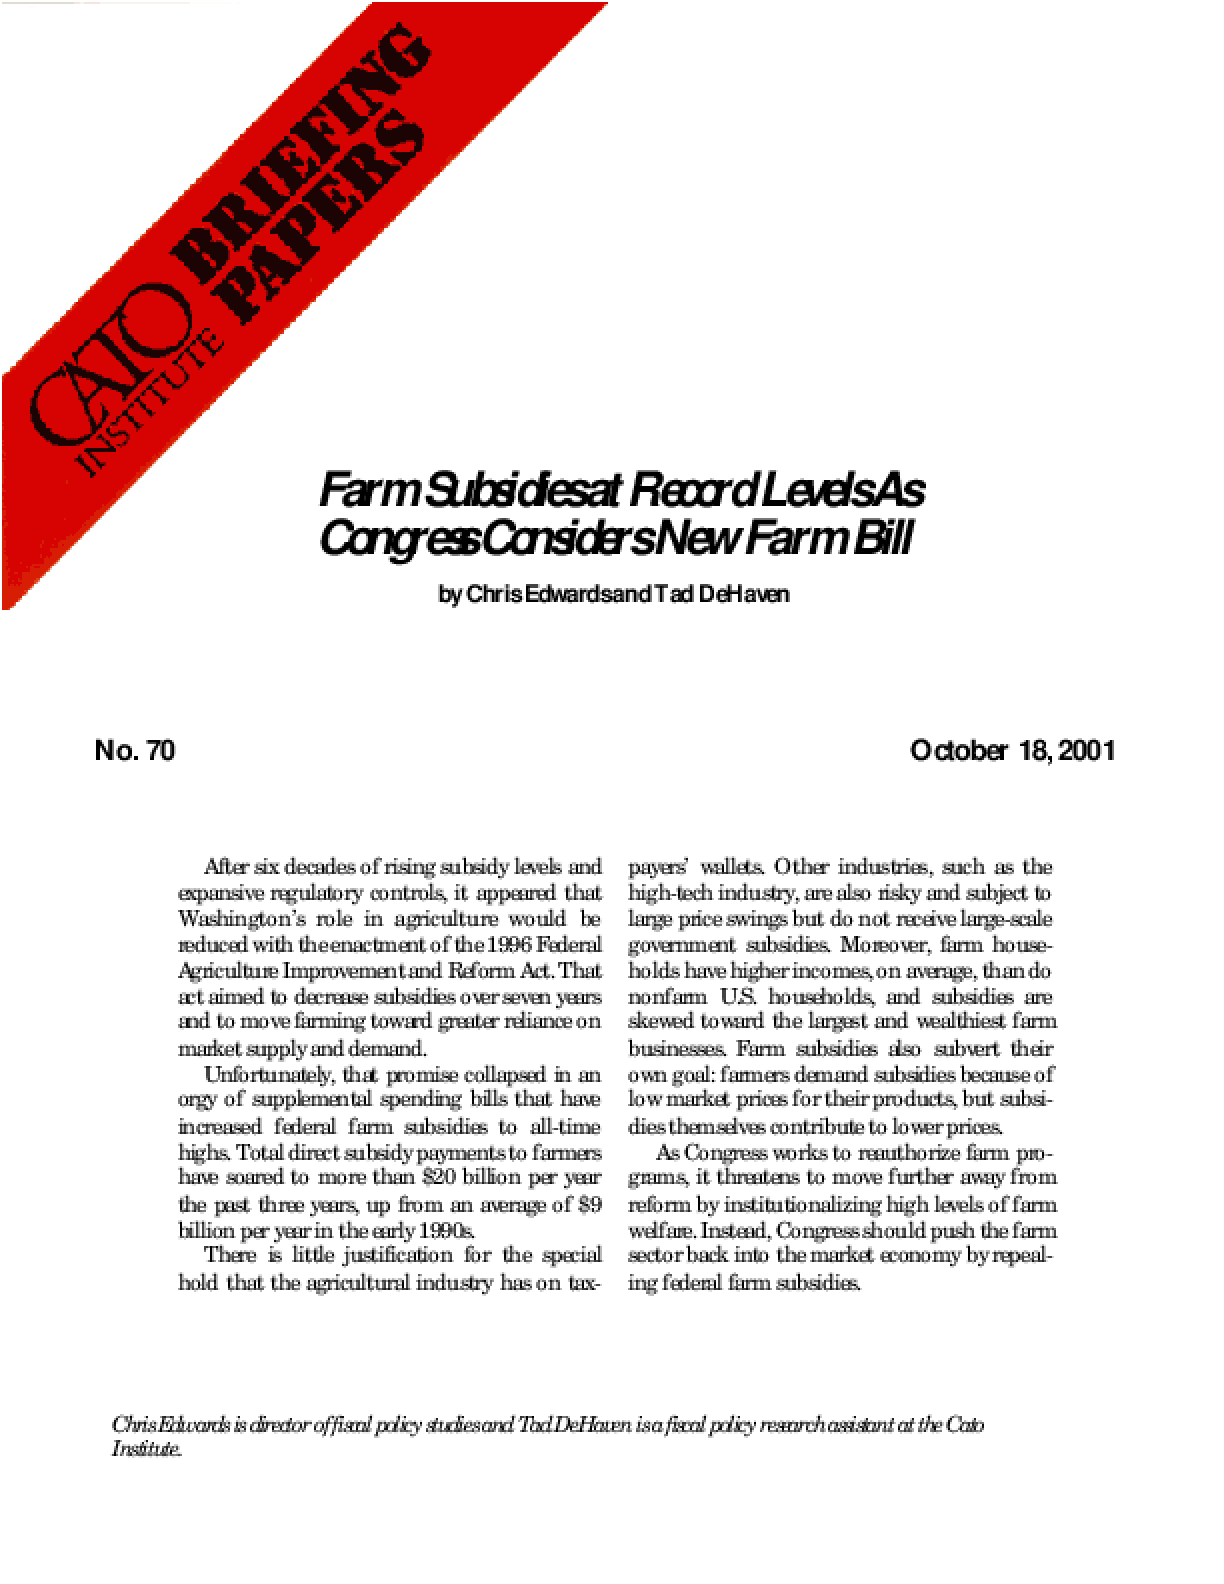 Farm Subsidies at Record Levels As Congress Considers New Farm Bill